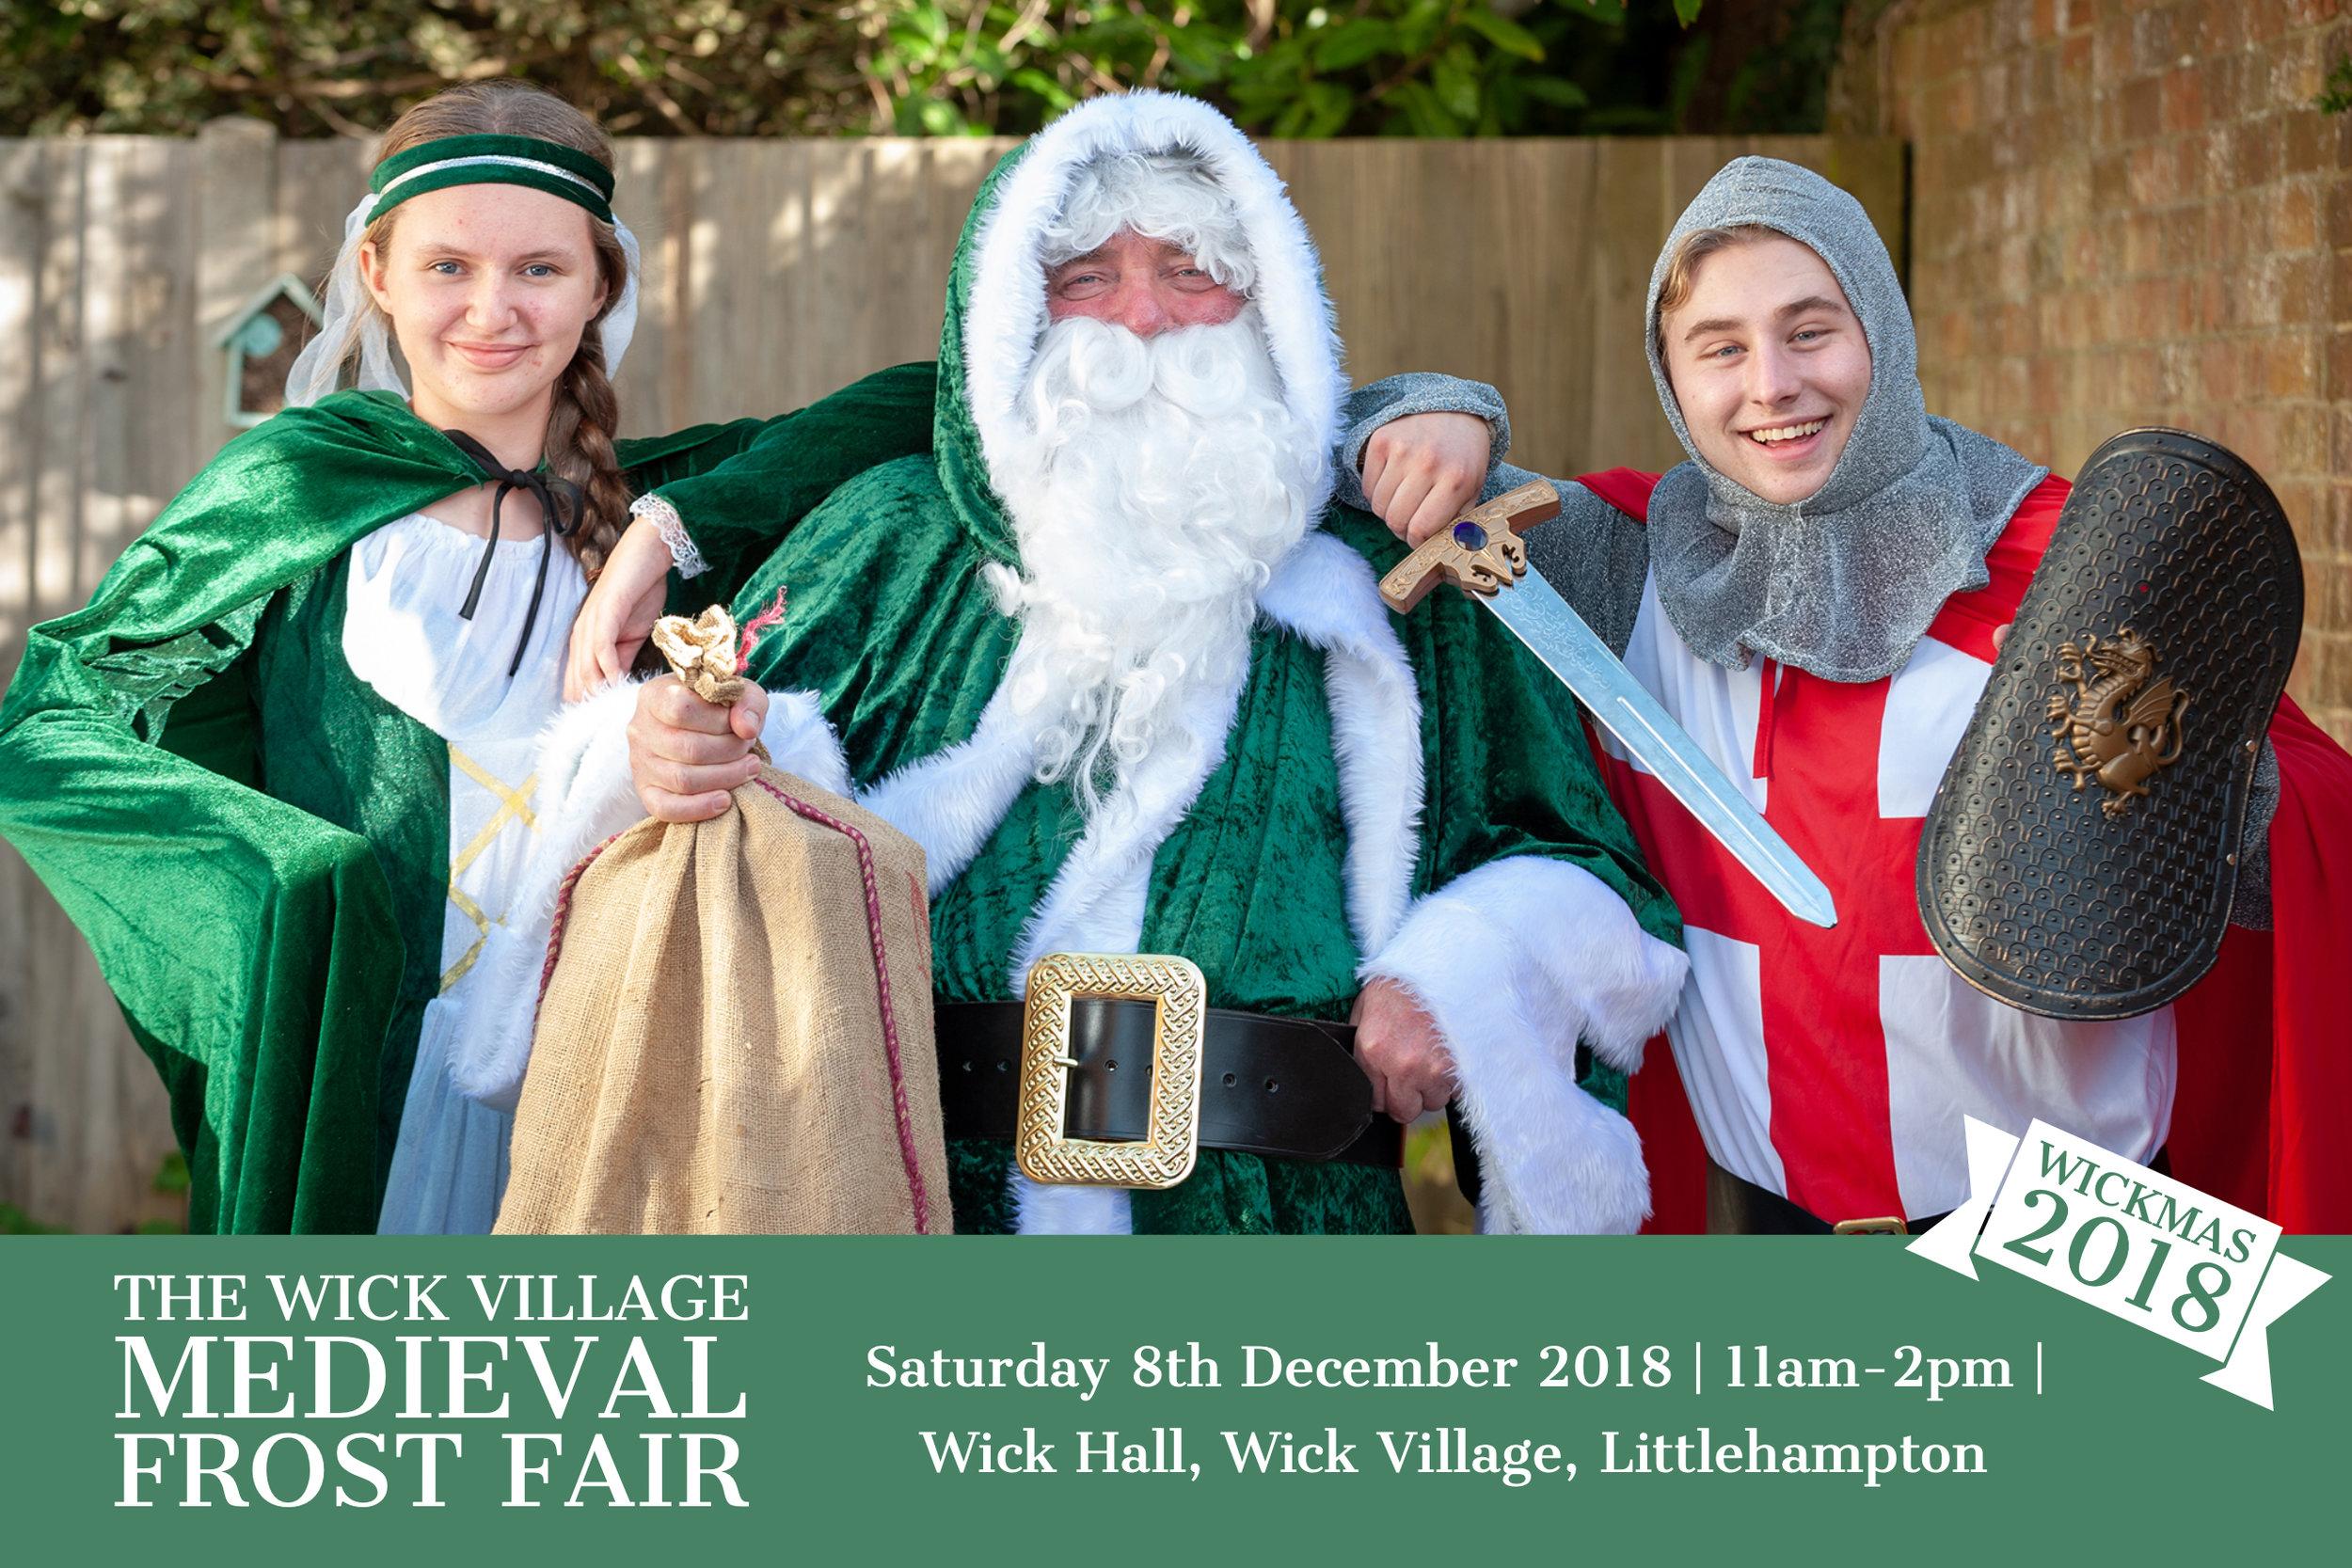 Wickmas 2018 - The Wick Village Medieval Christmas Frost Fair in Littlehampton, Sussex.